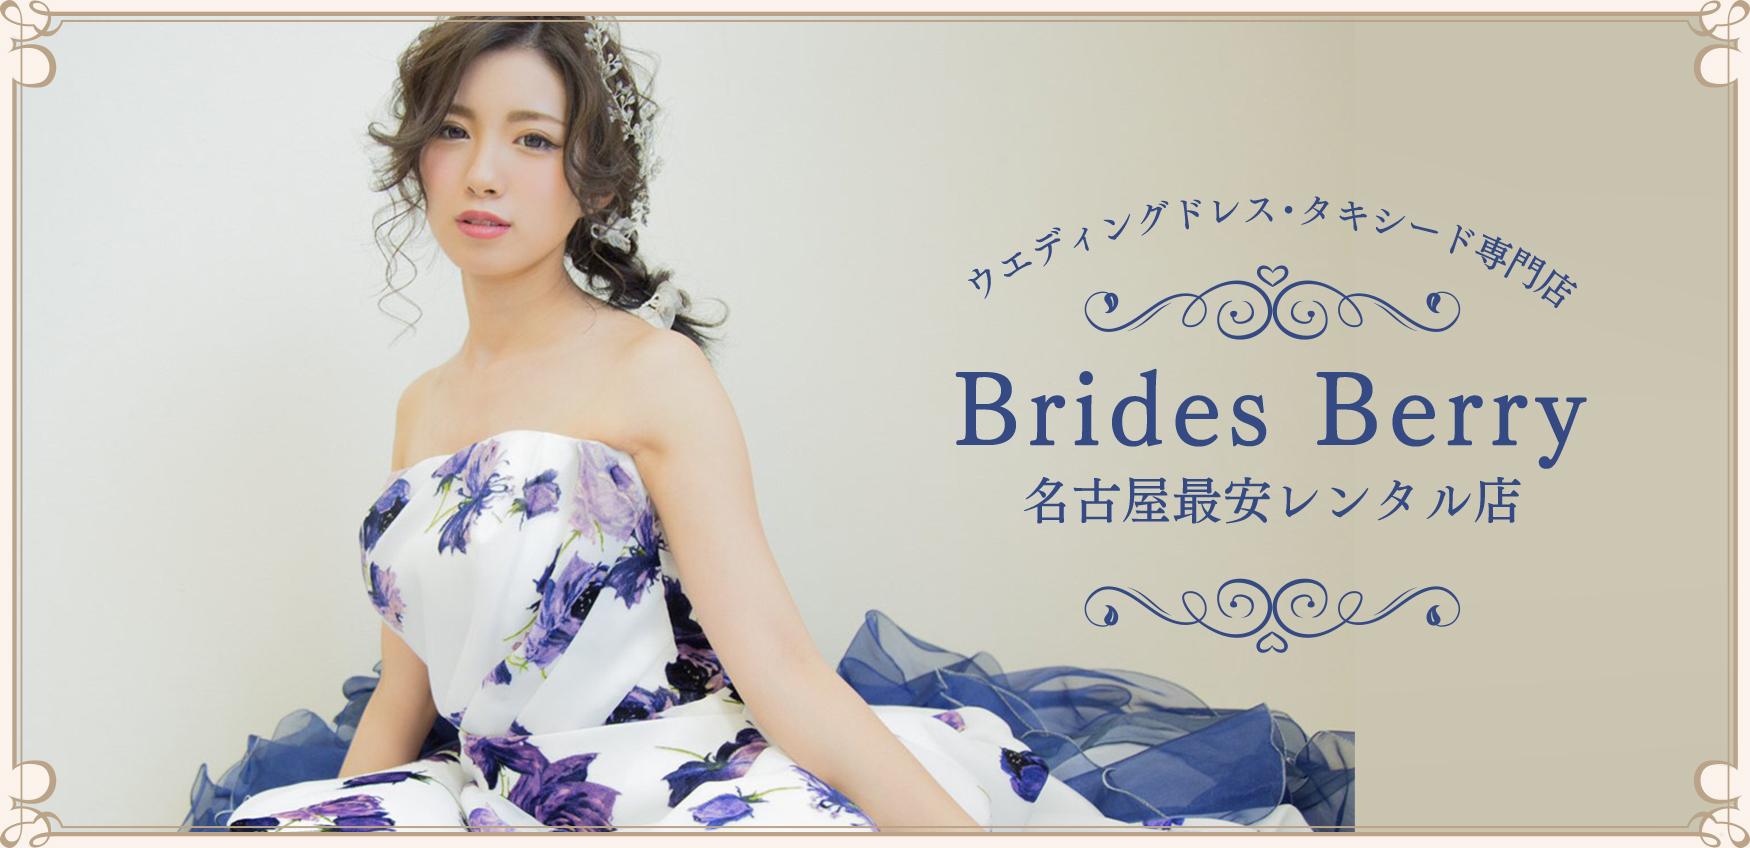 Brides Berry